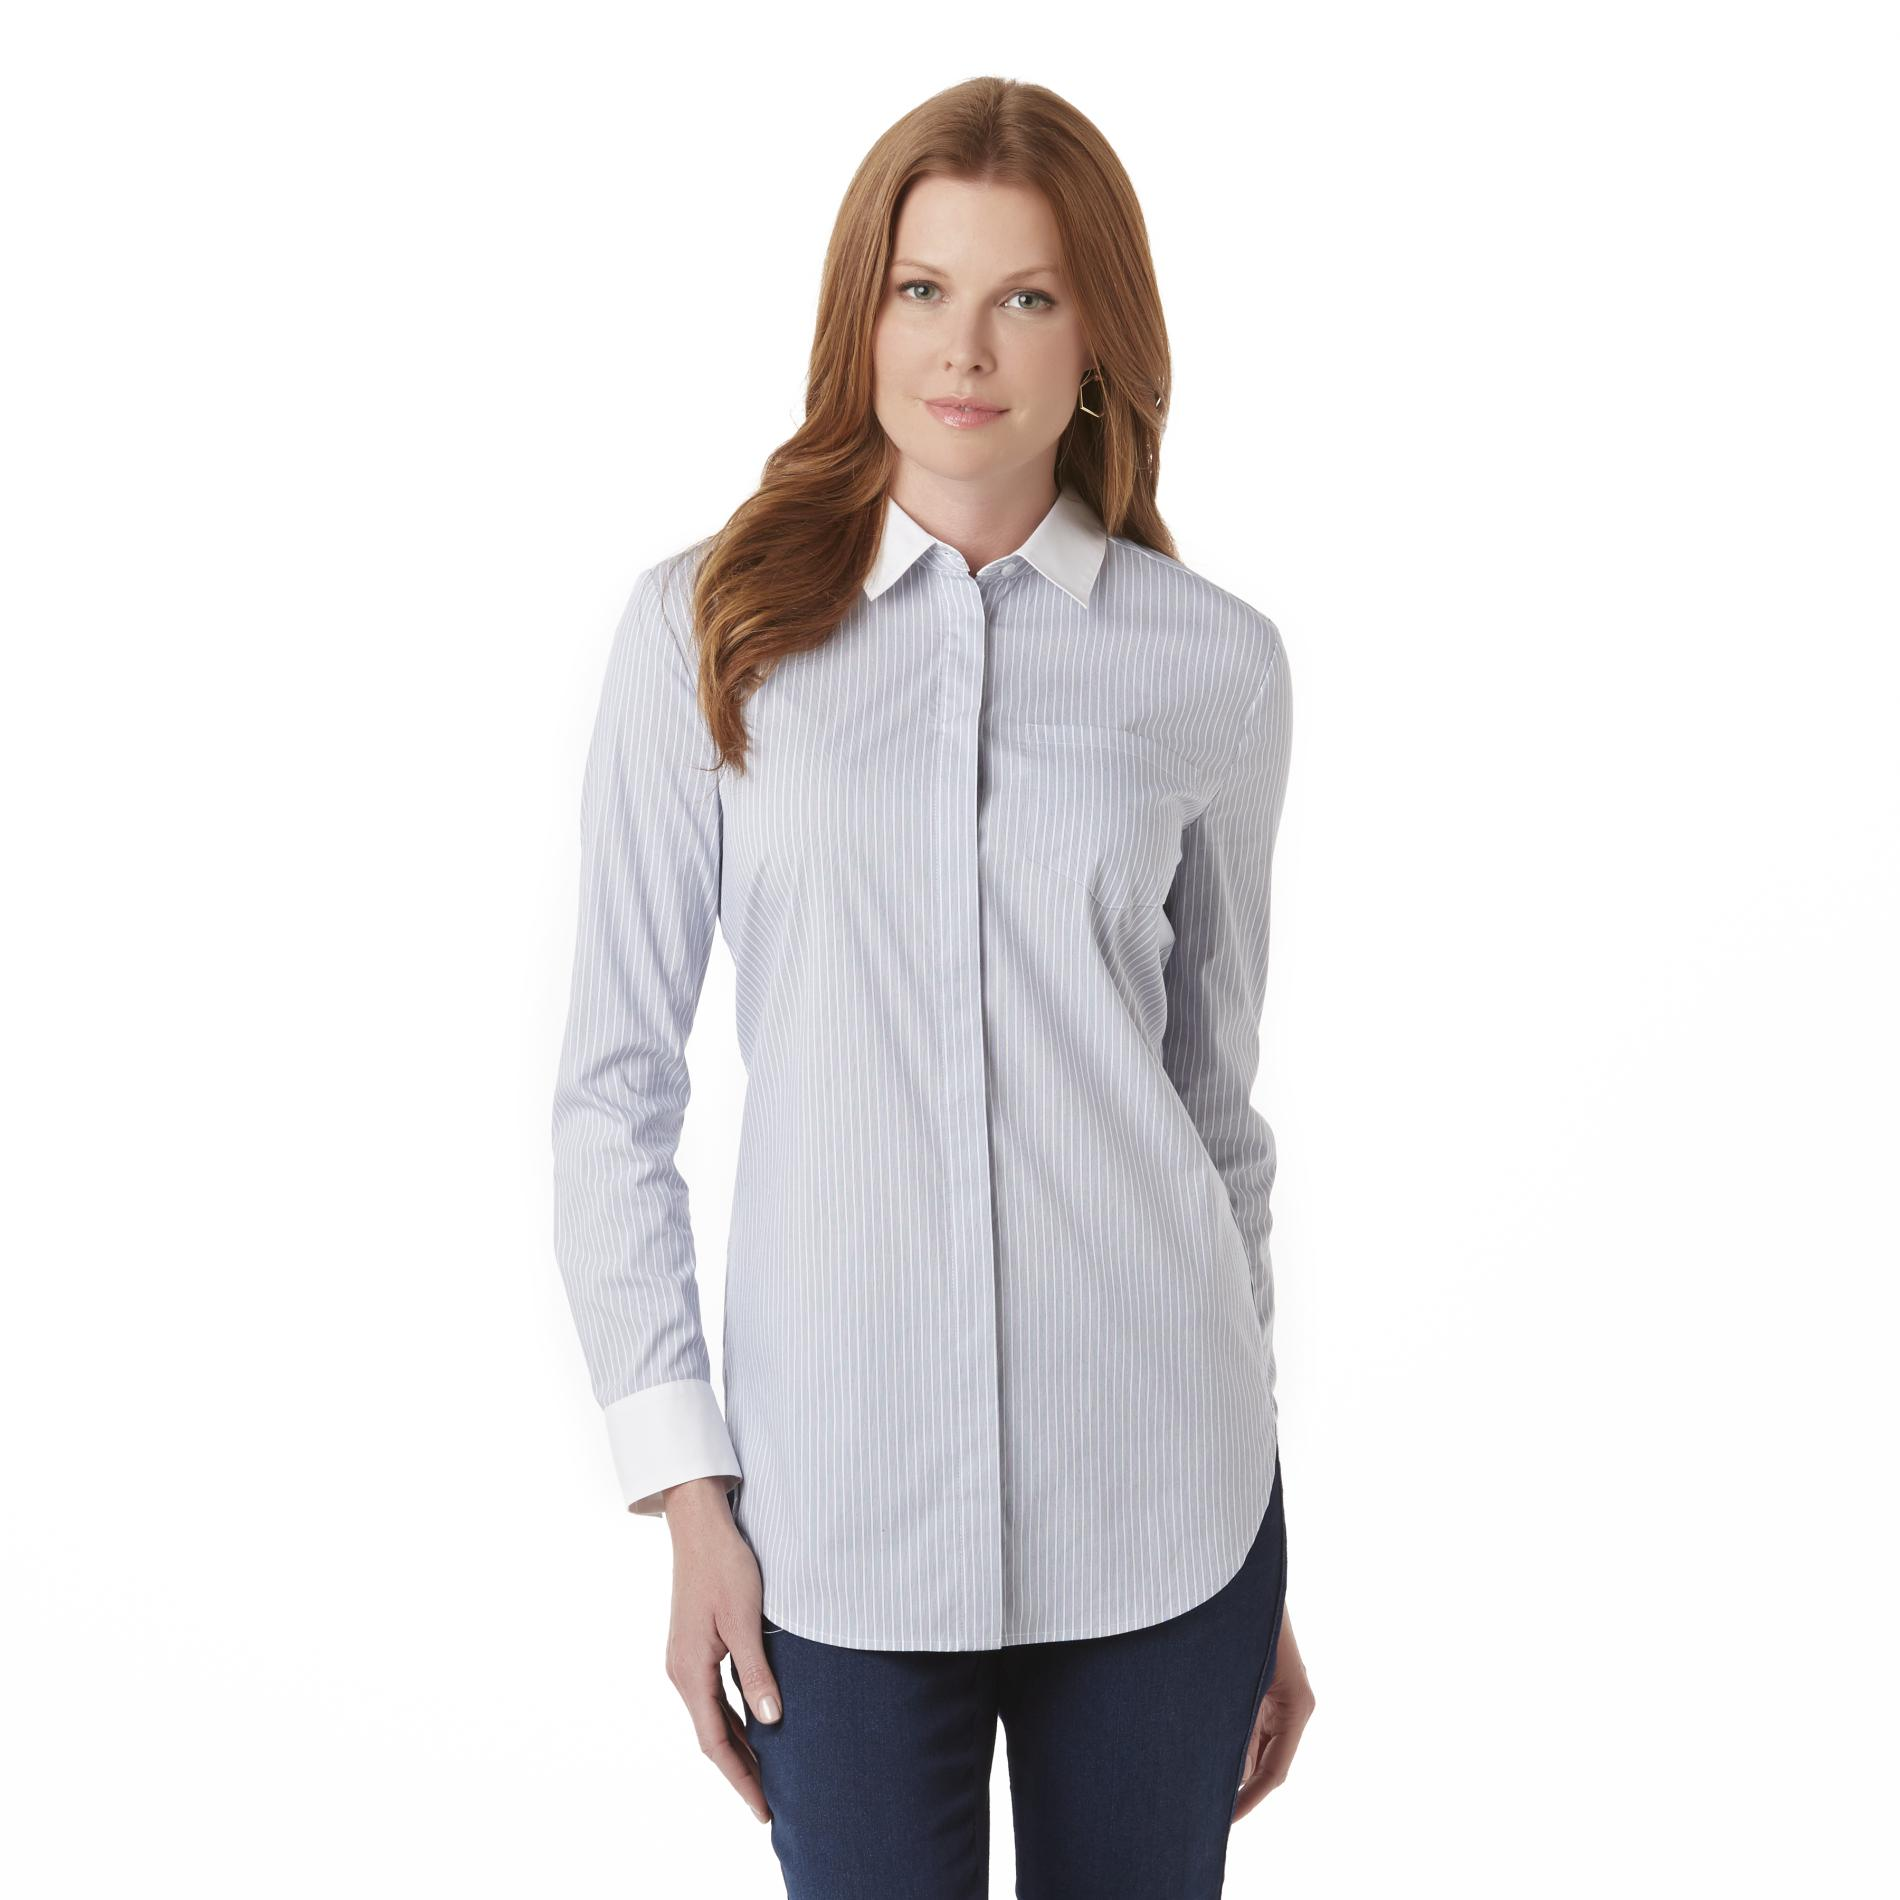 Women's Button-Front Blouse - Striped